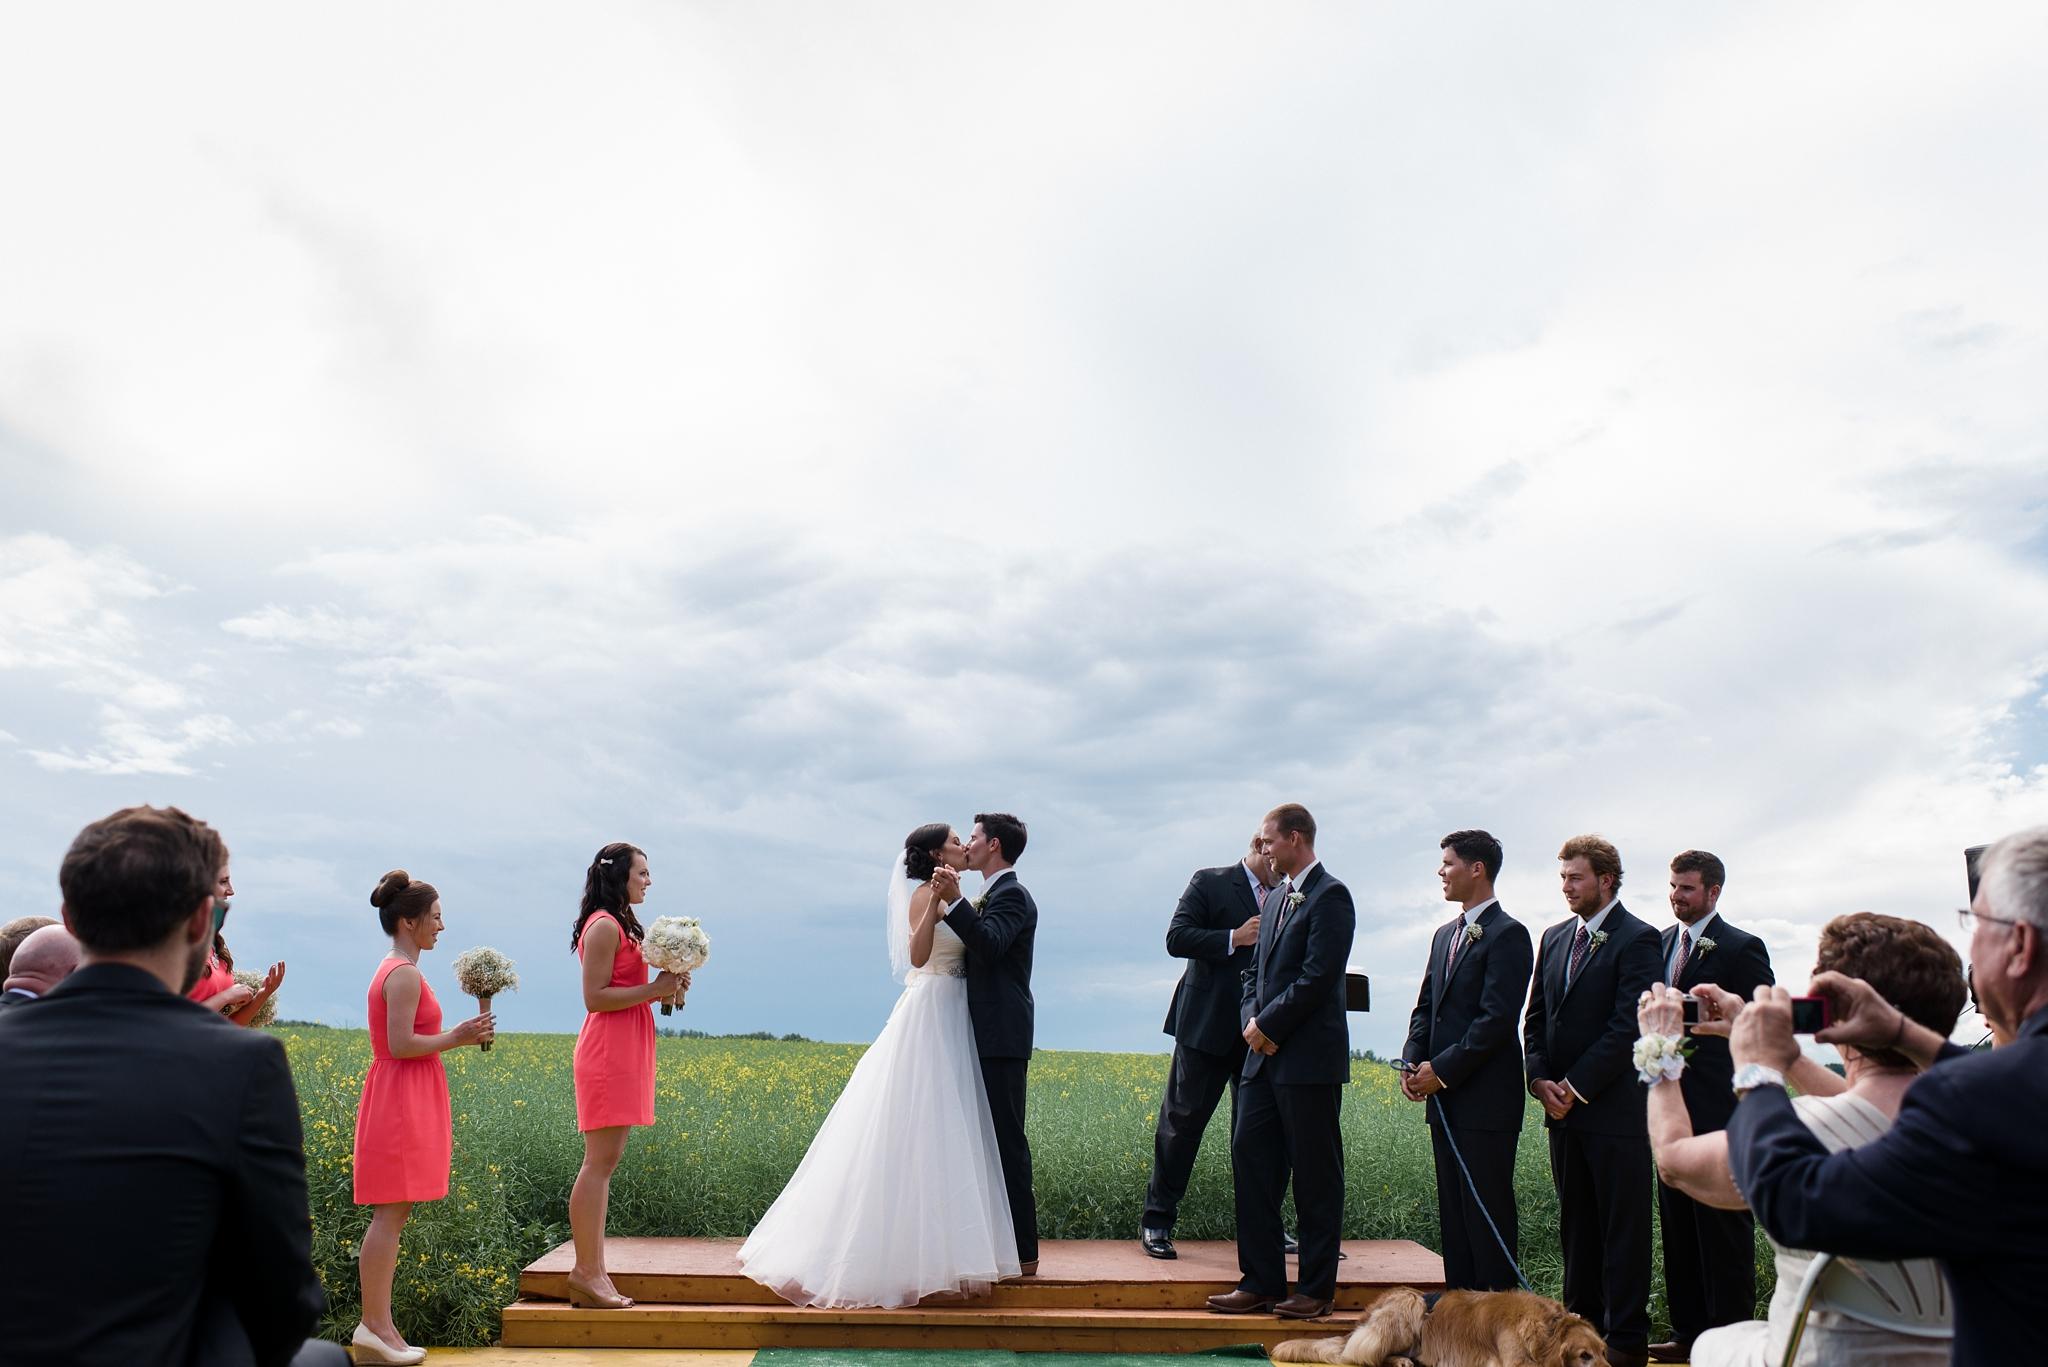 kaihla_tonai_intimate_wedding_elopement_photographer_0057